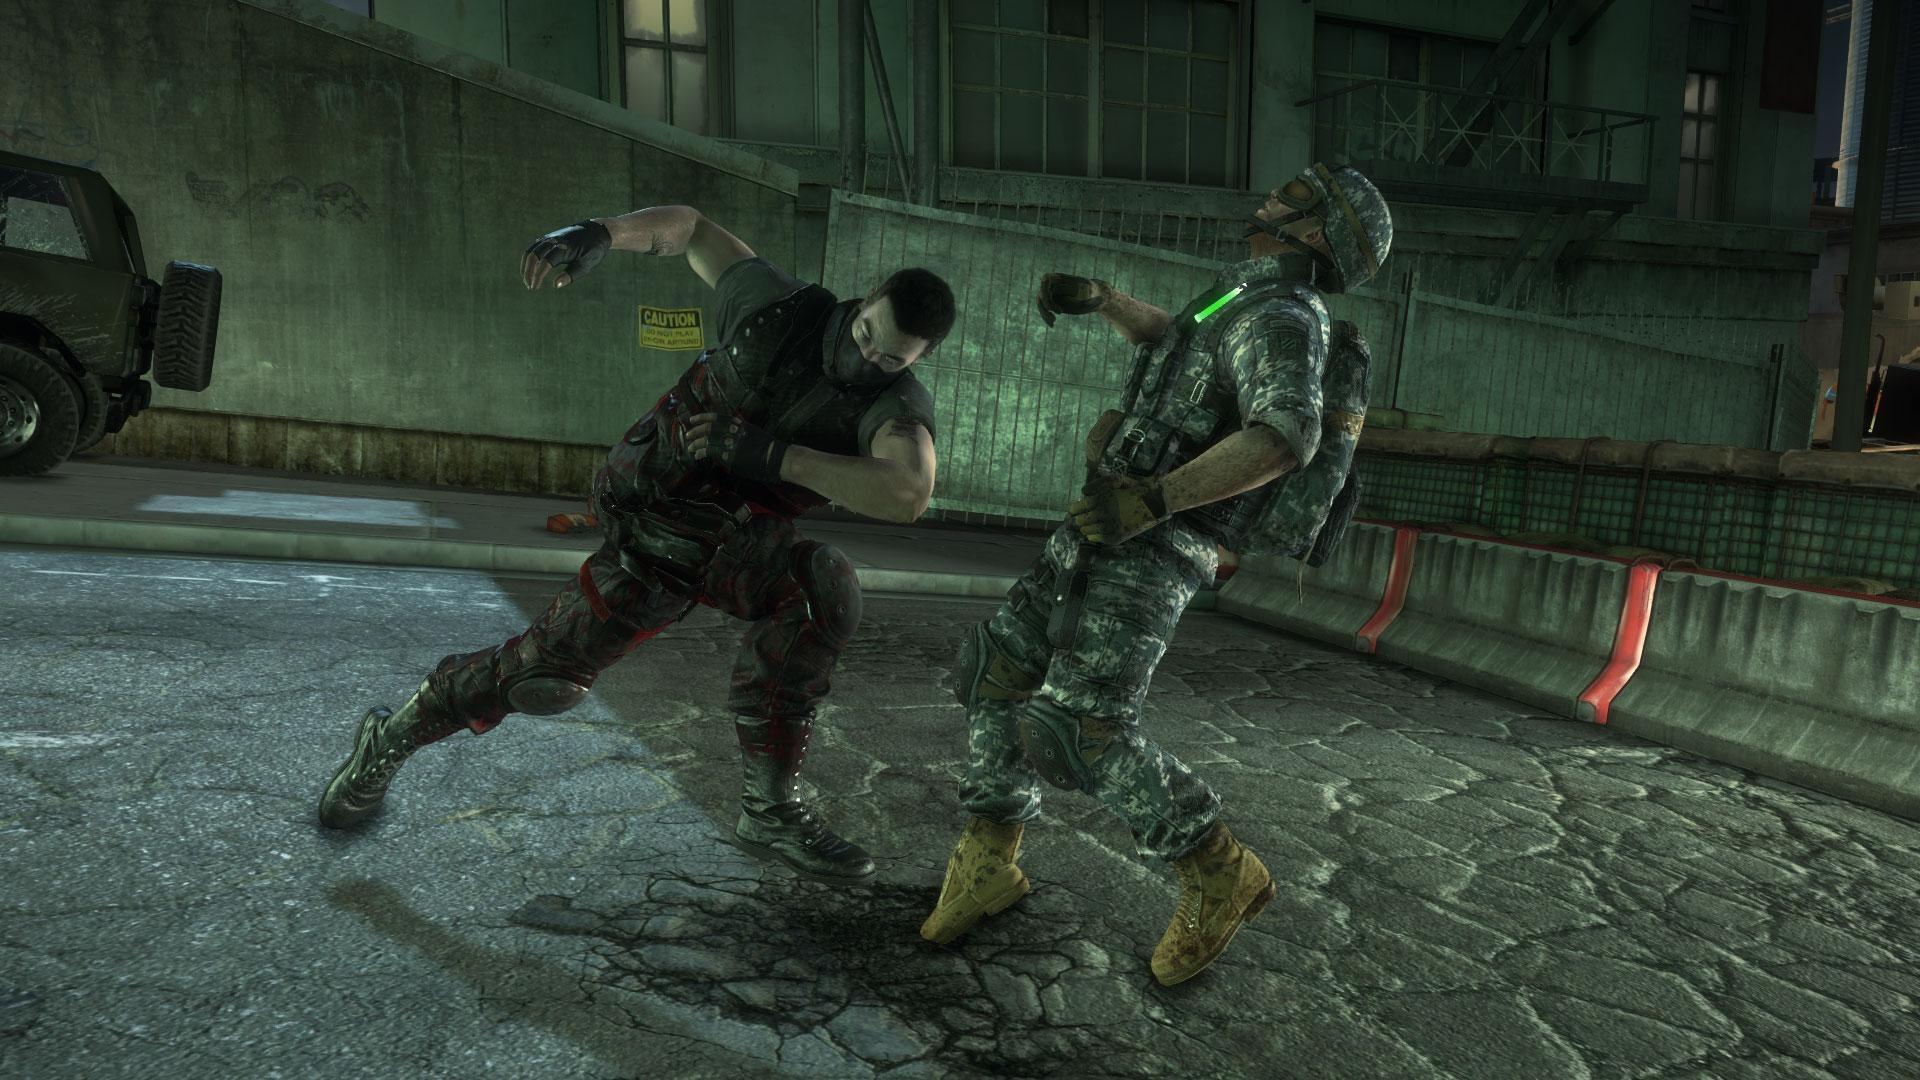 DeadRising3-OperationBrokenEagle Xbox One Editeur 009